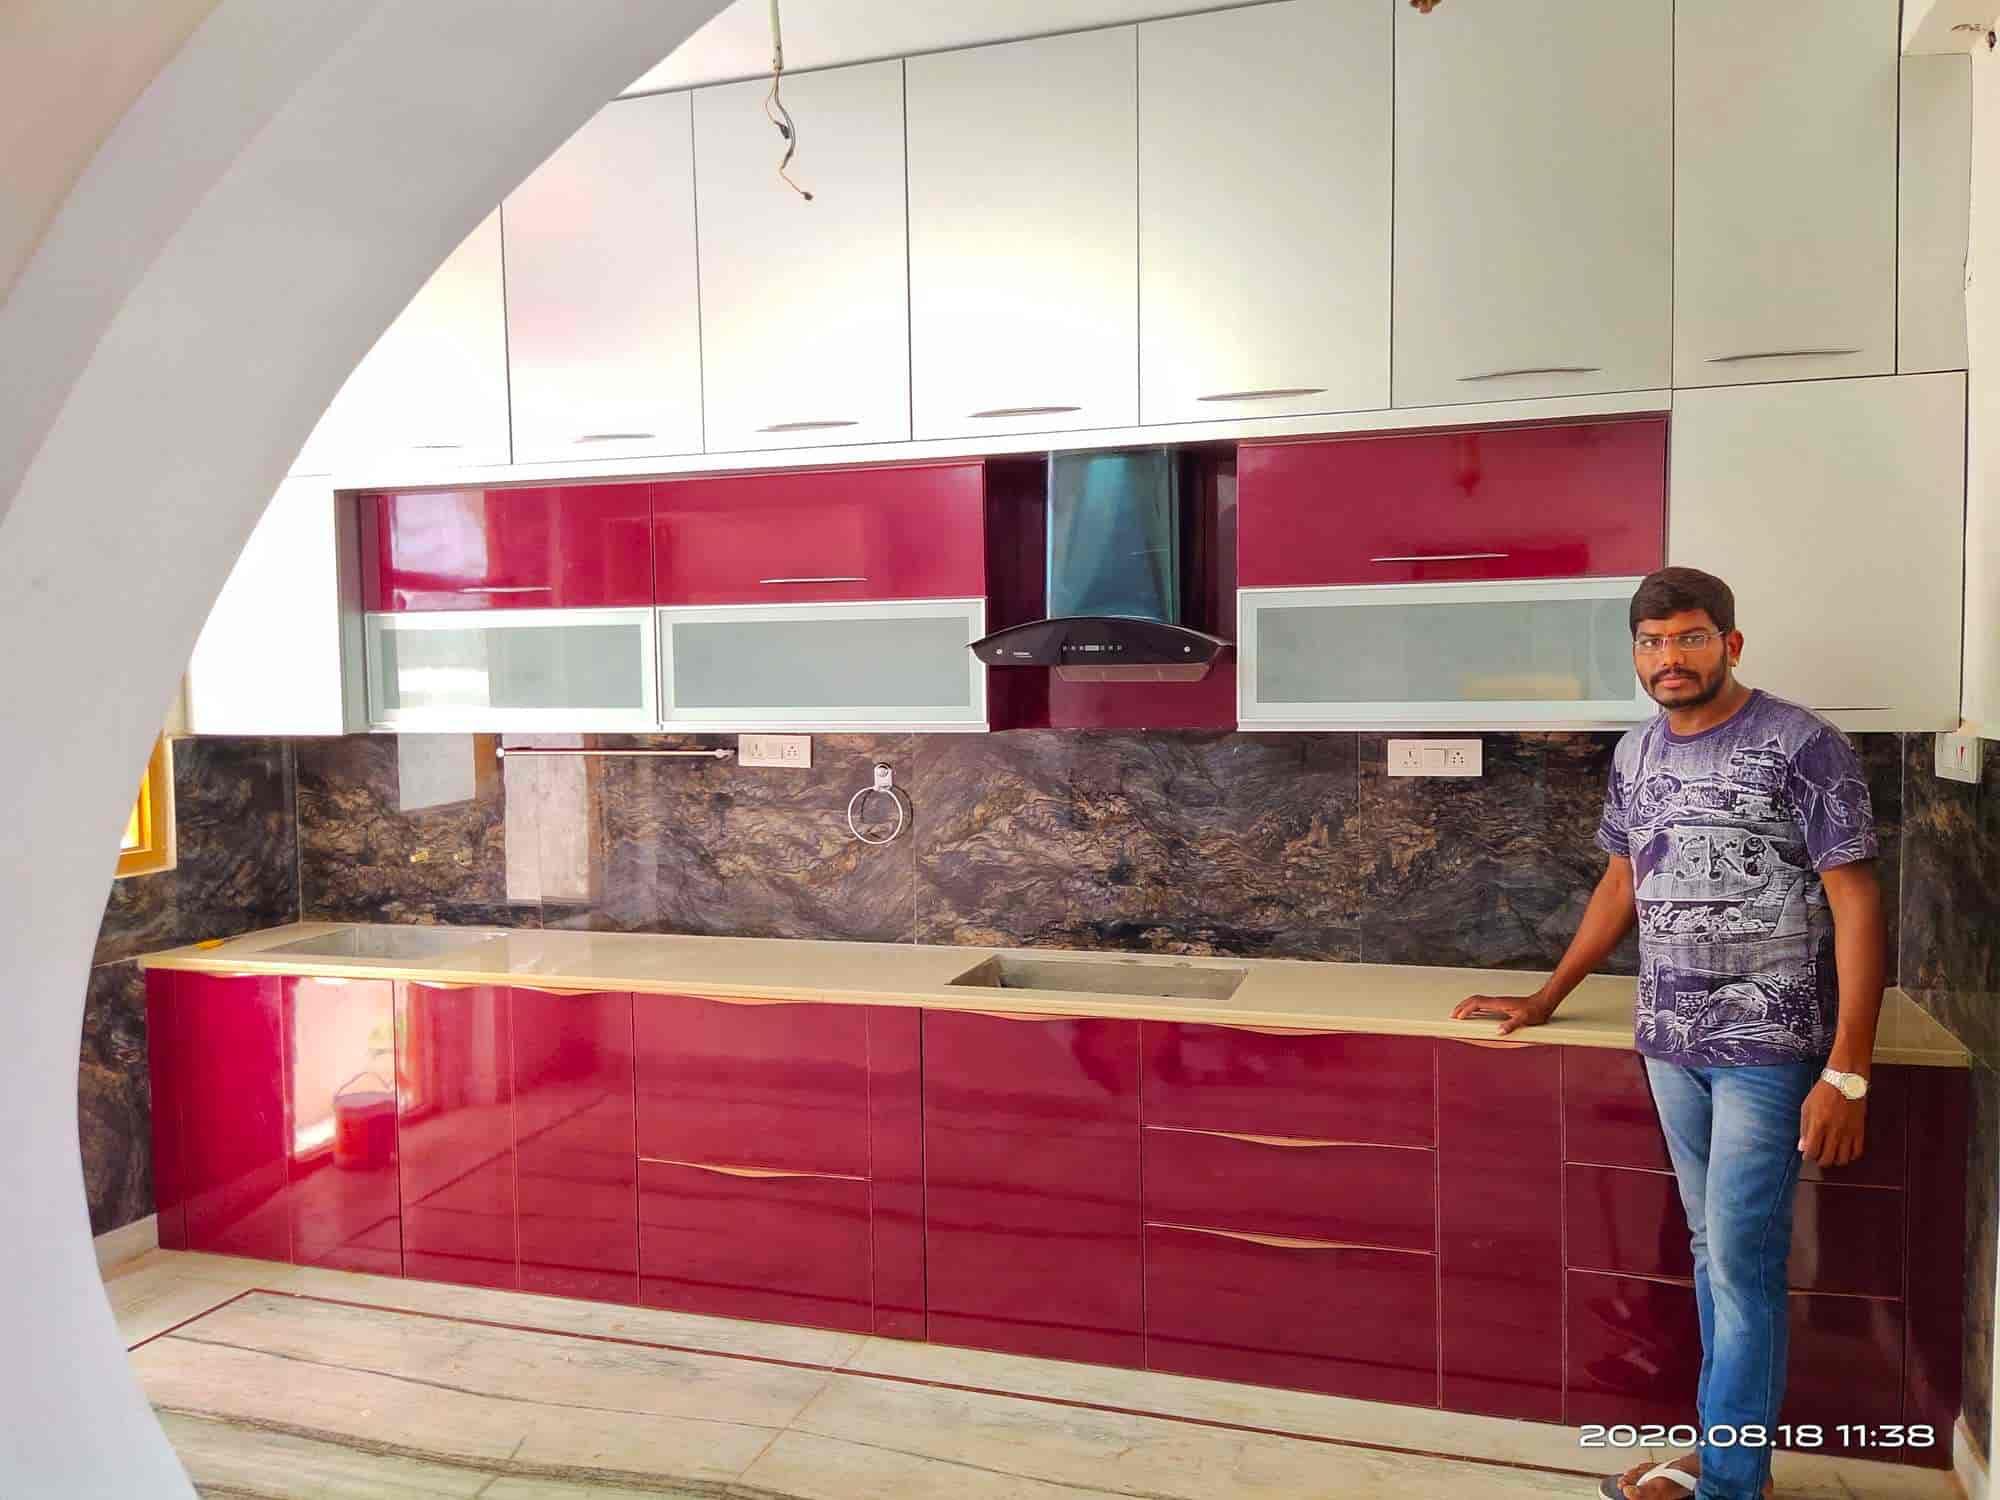 Top 100 Modular Kitchen Manufacturers In Hyderabad म ड लर क चन मन फक चरर स ह दर ब द Best Kitchen Furniture Designers Justdial